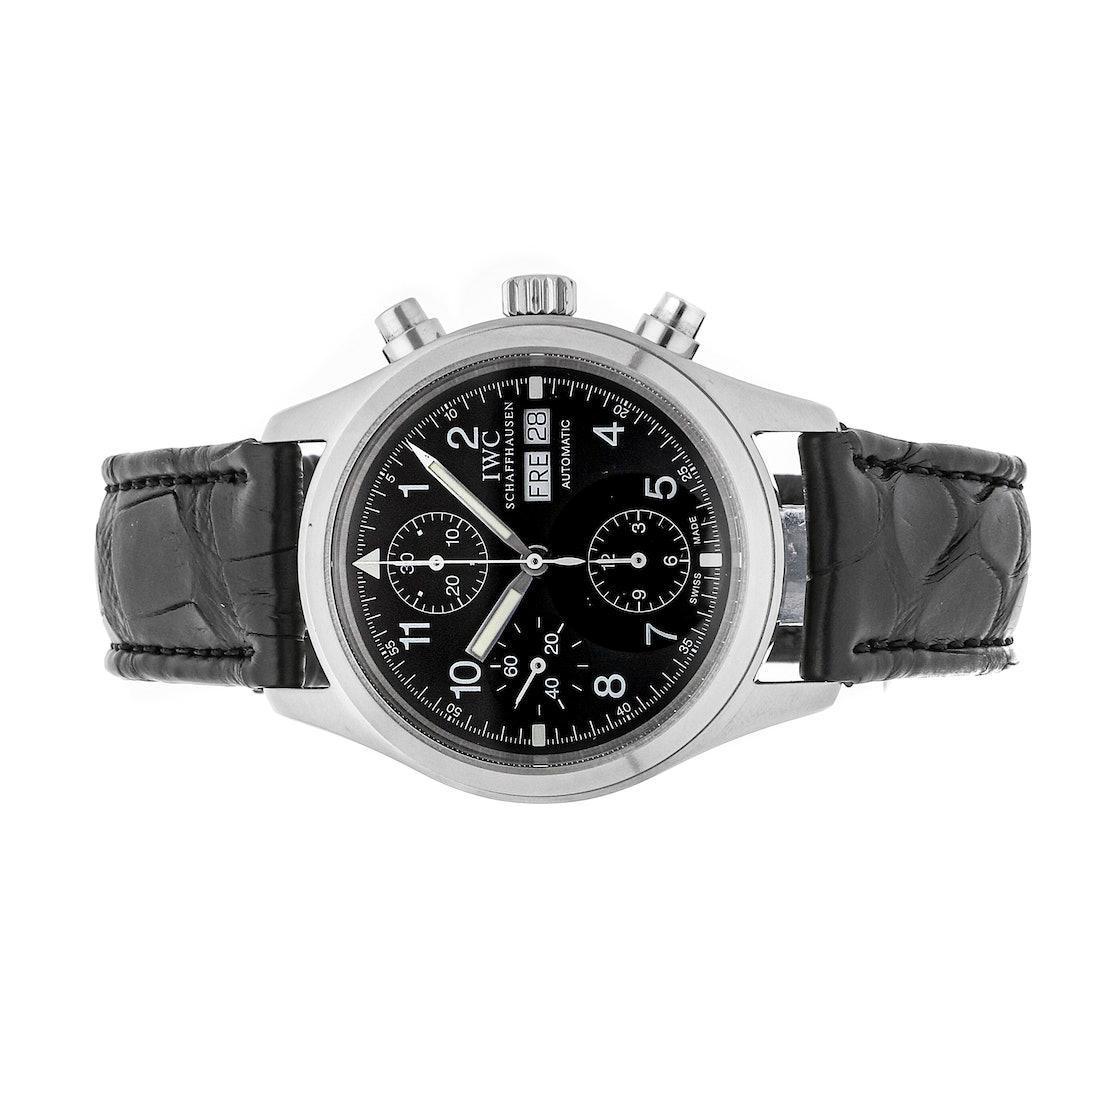 IWC Pilot's Chronograph IW3706